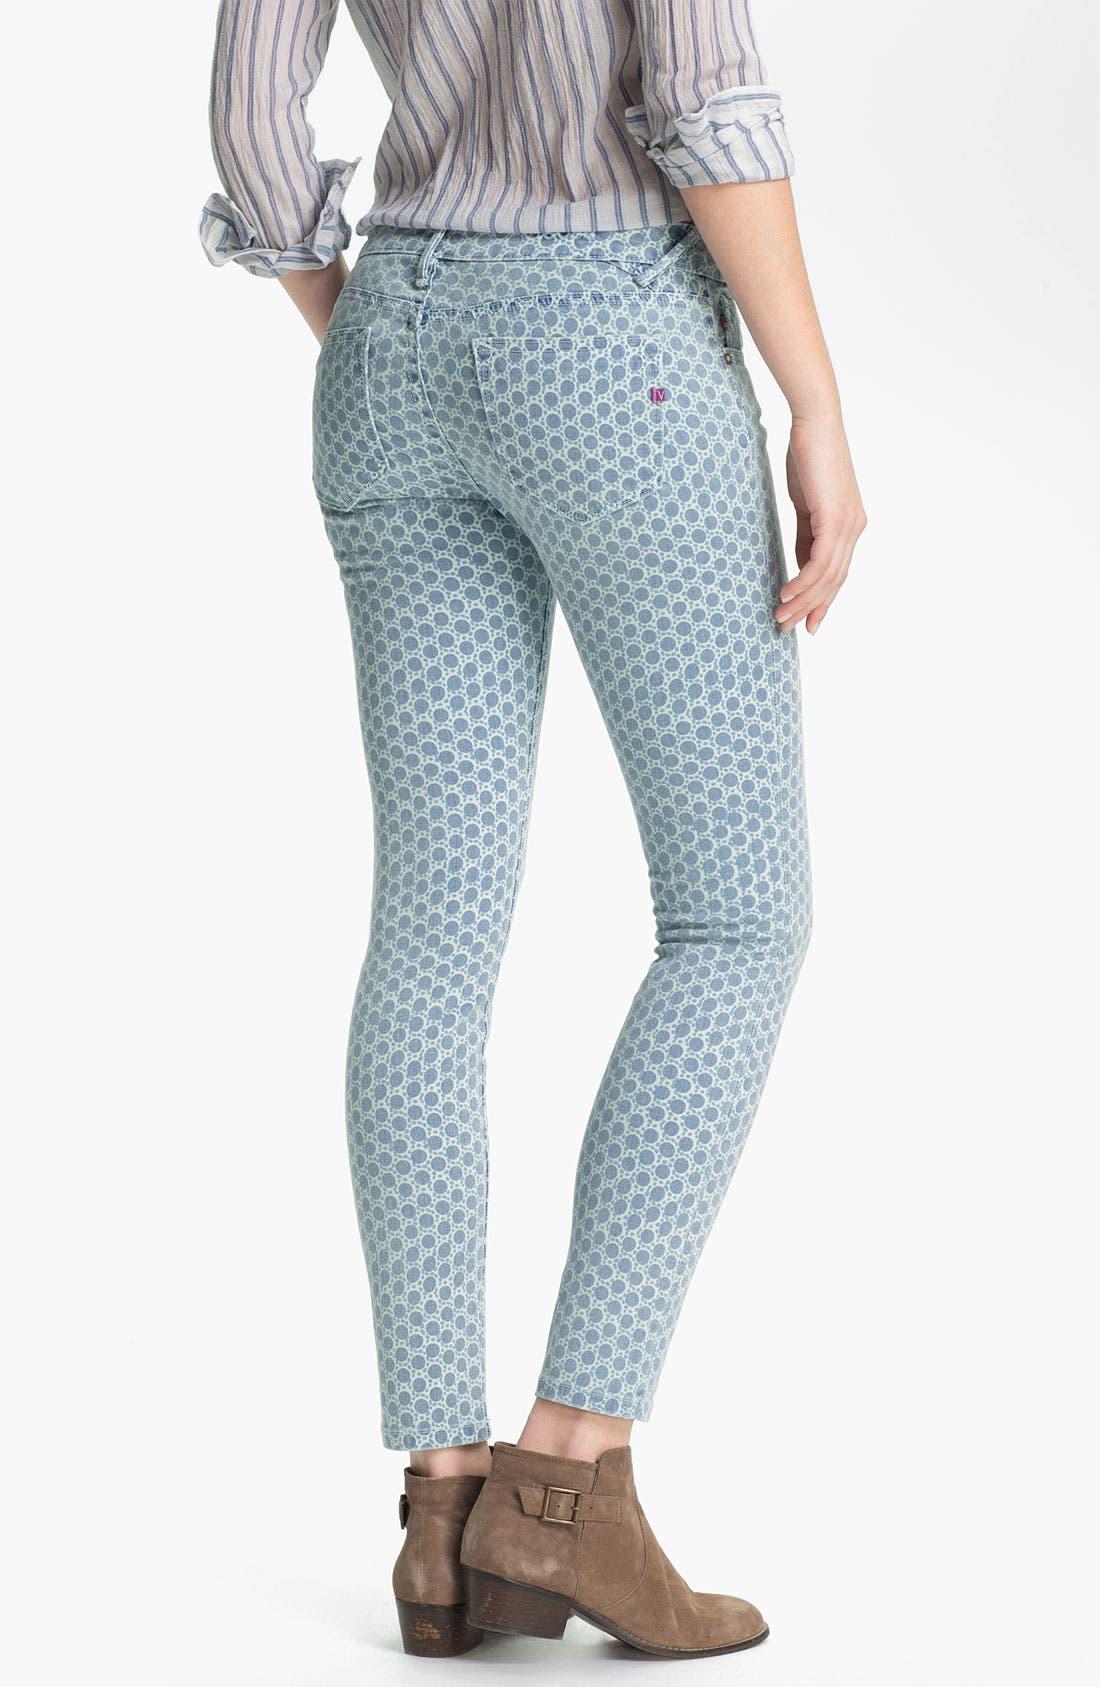 Alternate Image 1 Selected - Vigoss Print Skinny Jeans (Blue Dot) (Juniors)